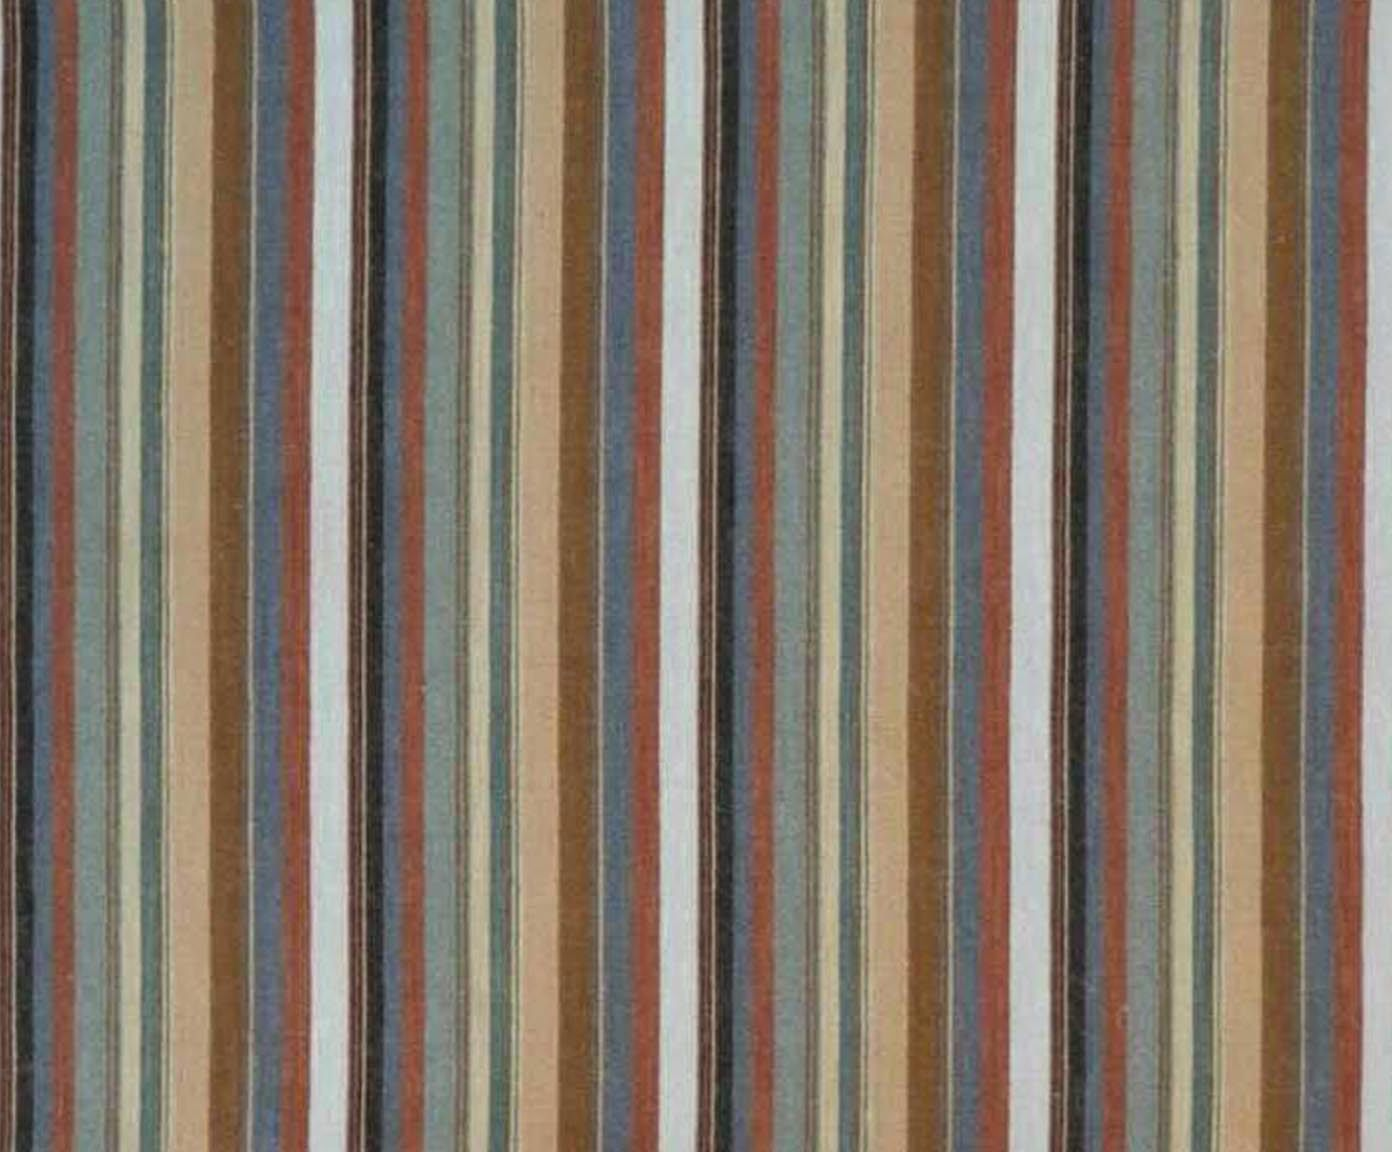 Tapete mumbai kilim - 300x300cm | Westwing - Casa & Decoração